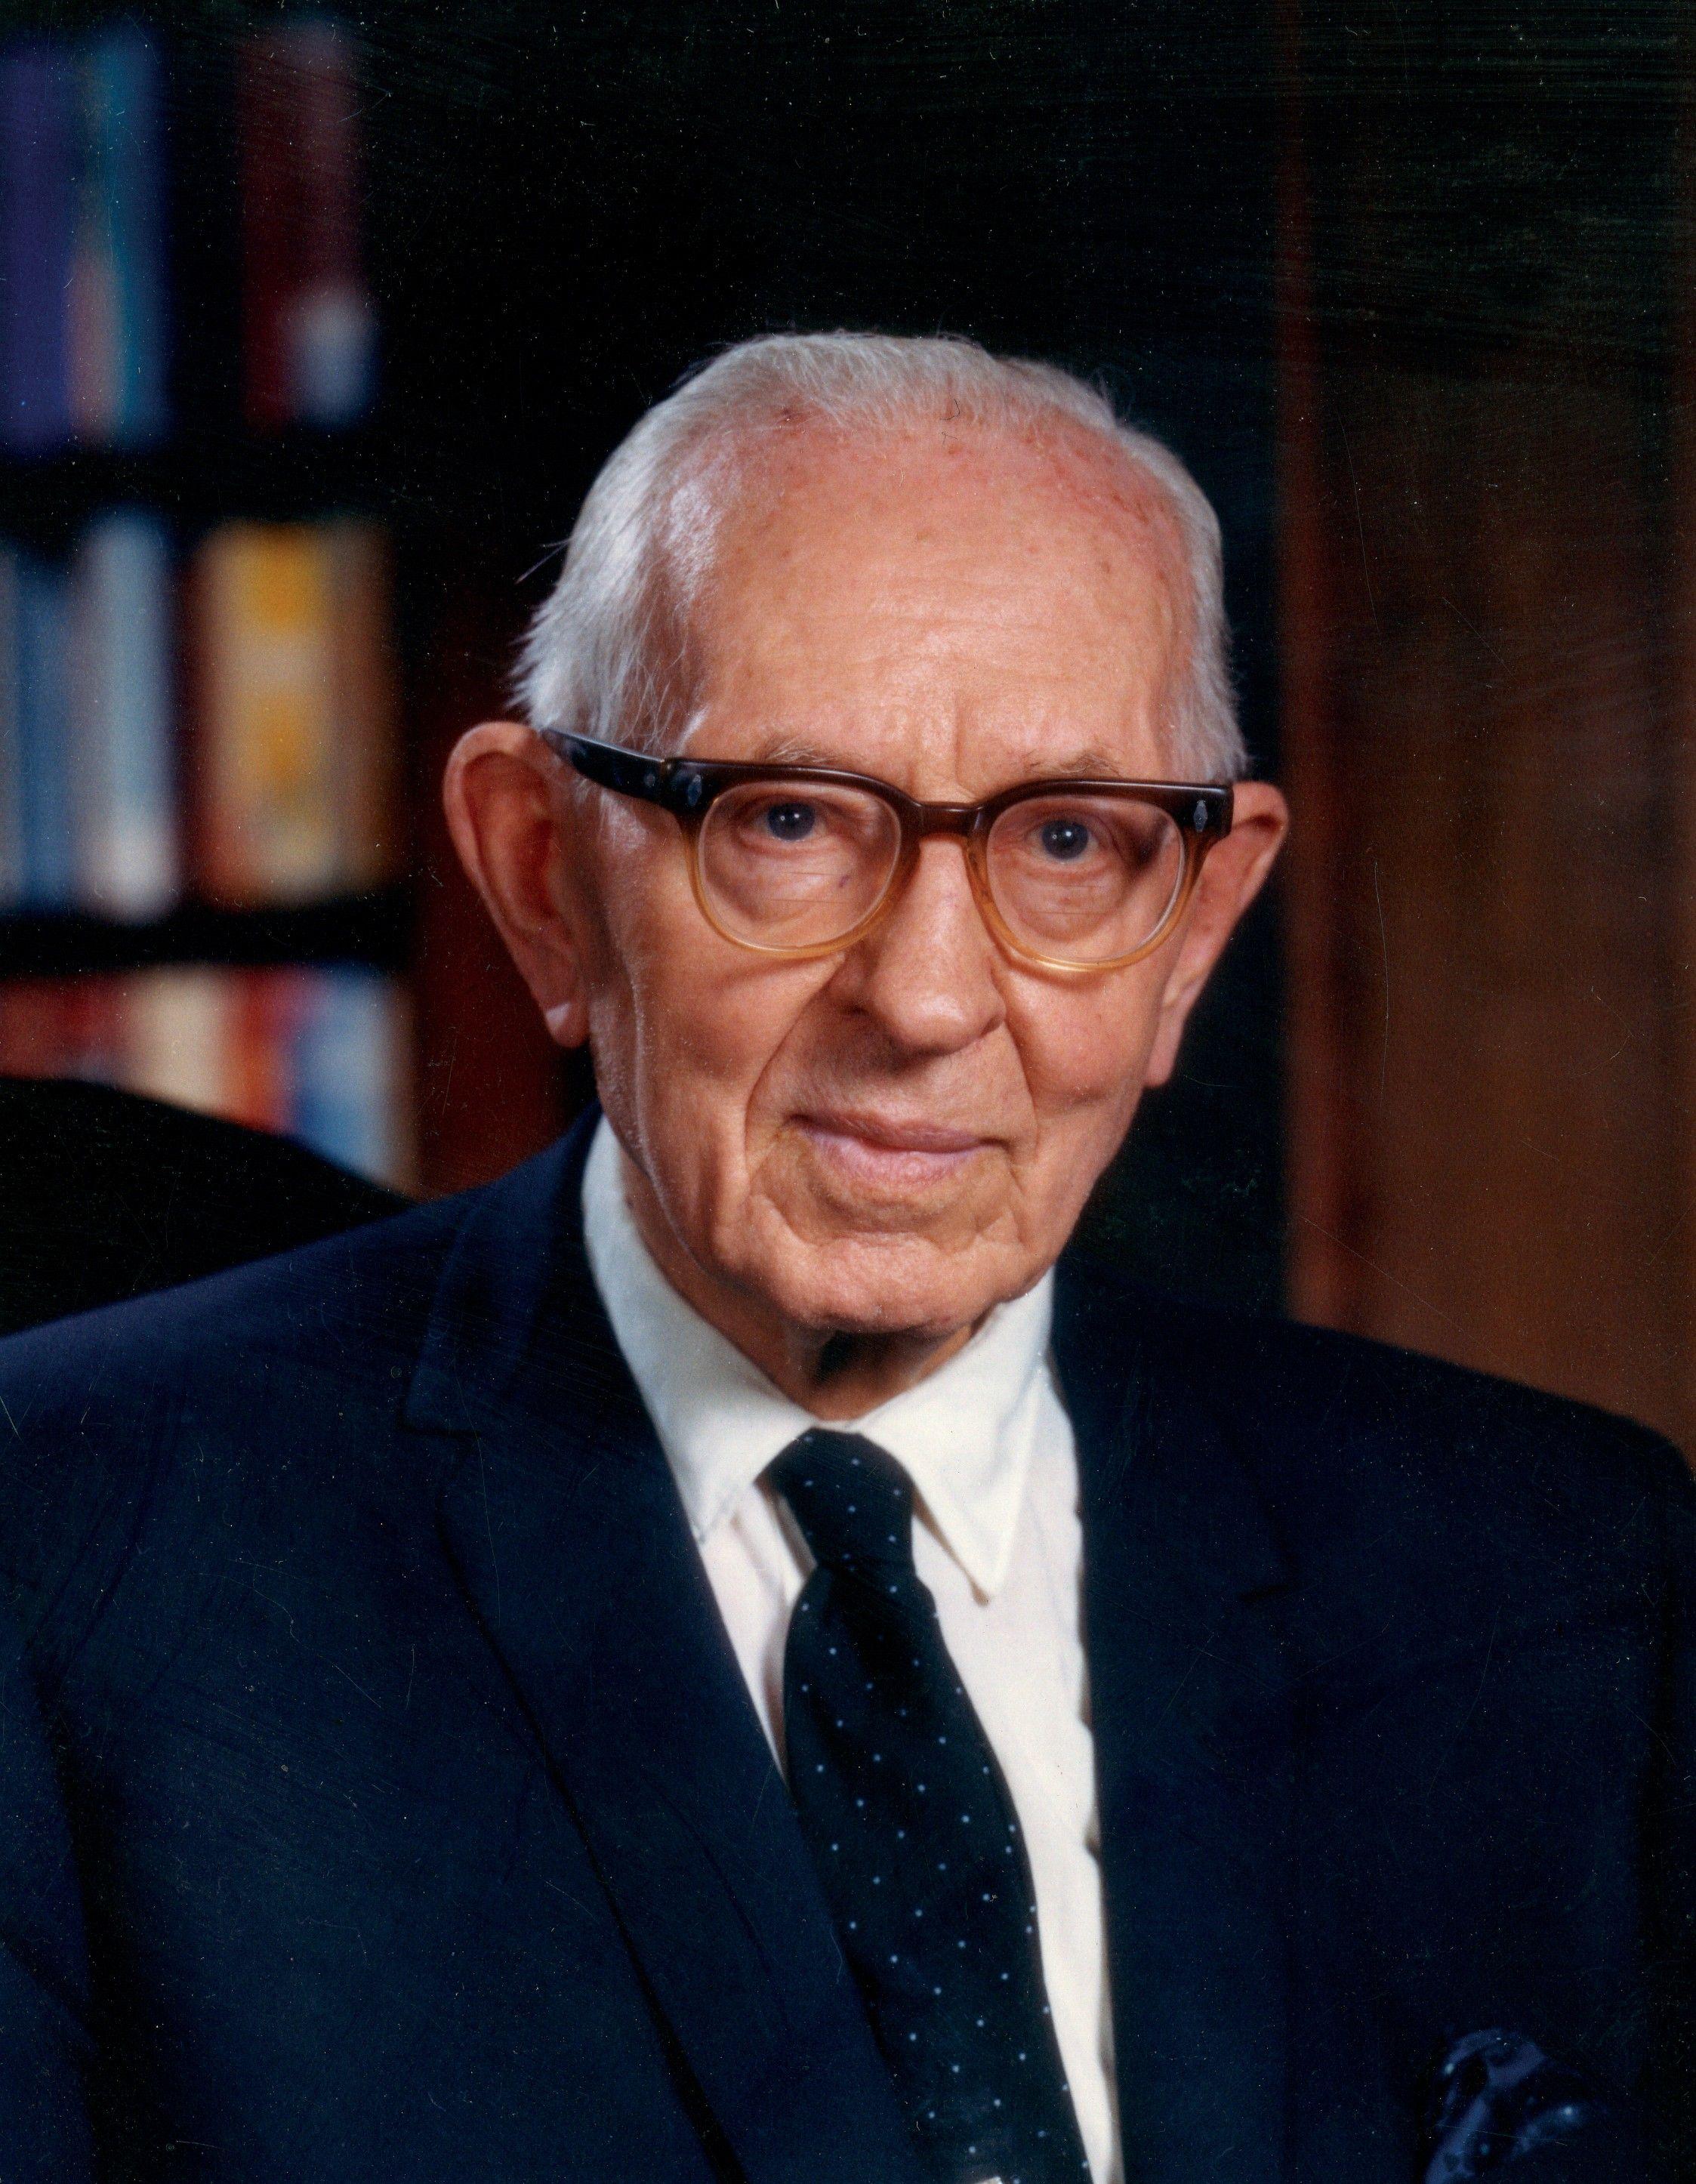 President Joseph Fielding Smith sitting in his office. Teachings of Presidents of the Church: Joseph Fielding Smith (2013), 82